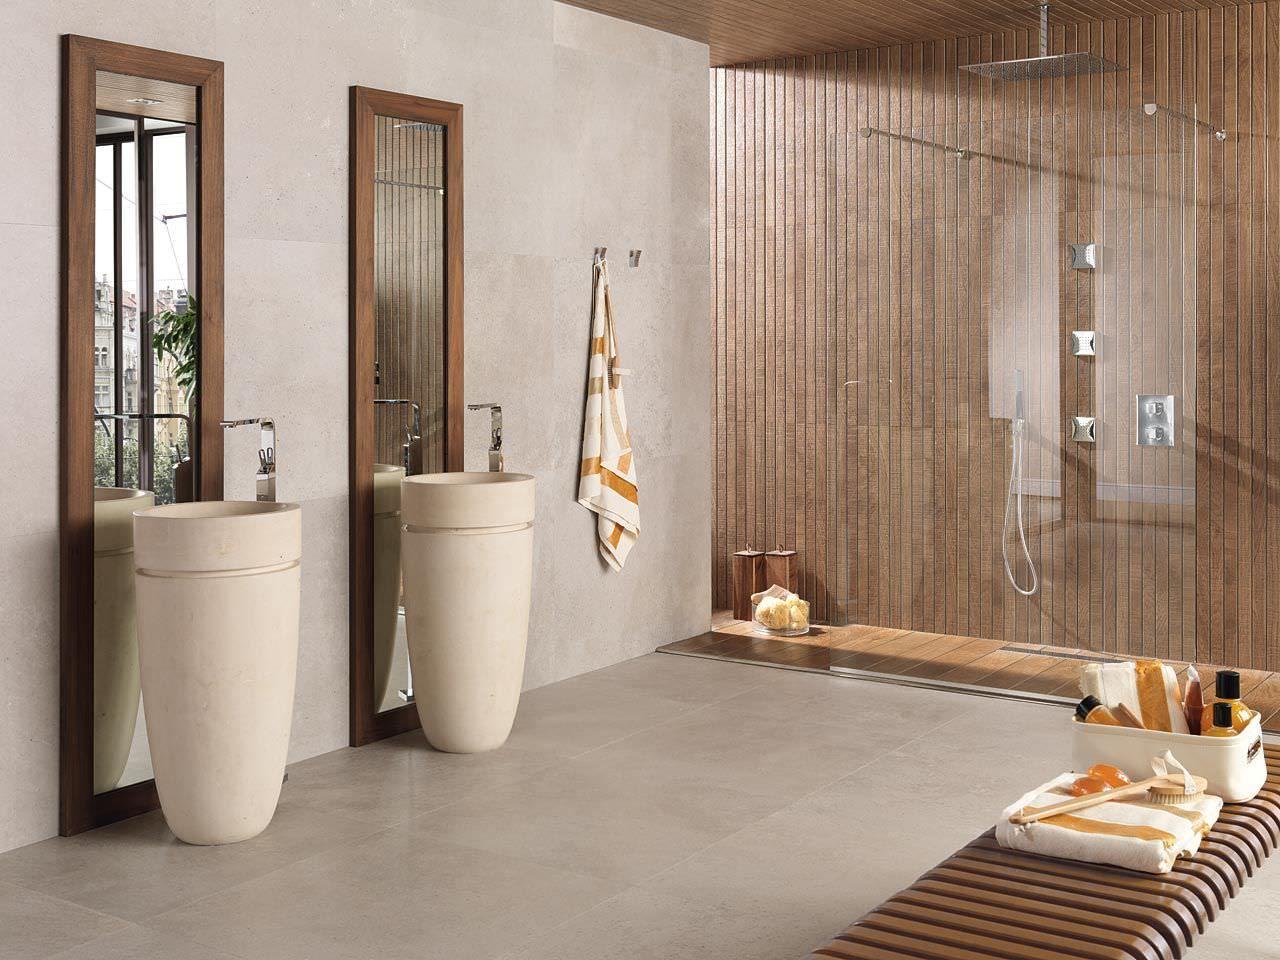 Salle De Bain Avec Rampant ~ carrelage de salle de bain de sol en gr s c rame poli ston ker